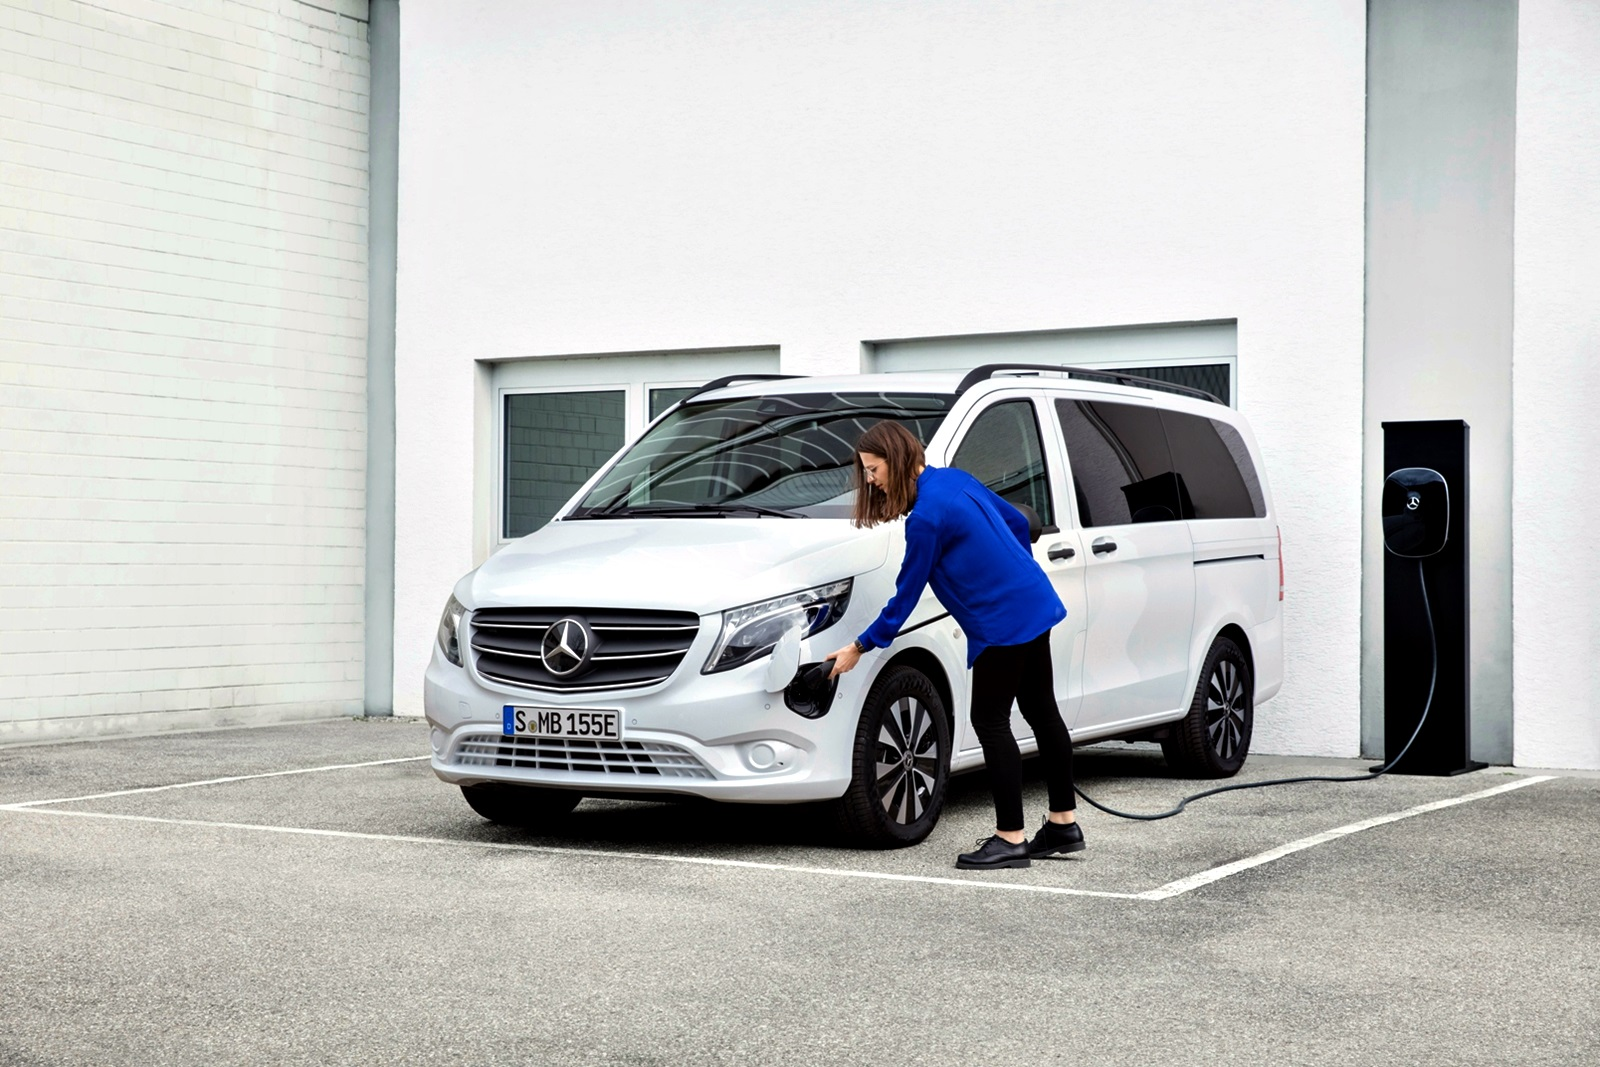 Mercedes Benz Evito Tourer furgonetas